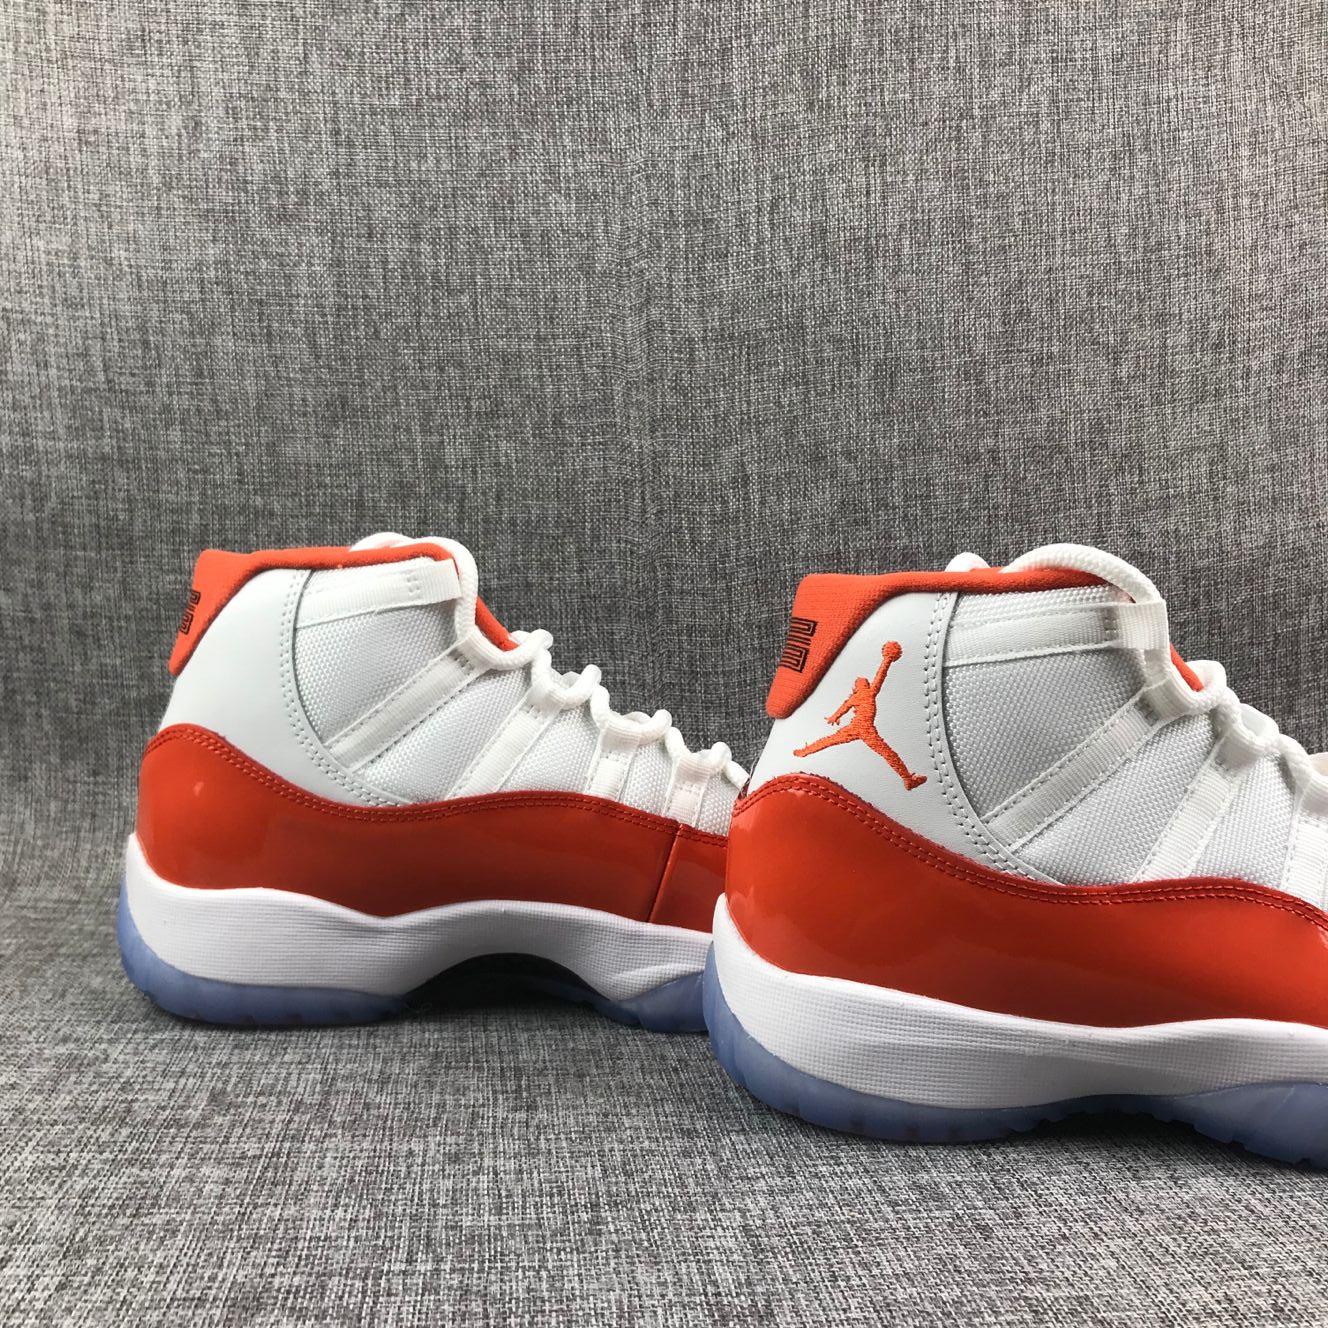 4c259ea1d20 Men Basketball Shoes New Air Retro 11 Shoes · YogaCloth · Online ...